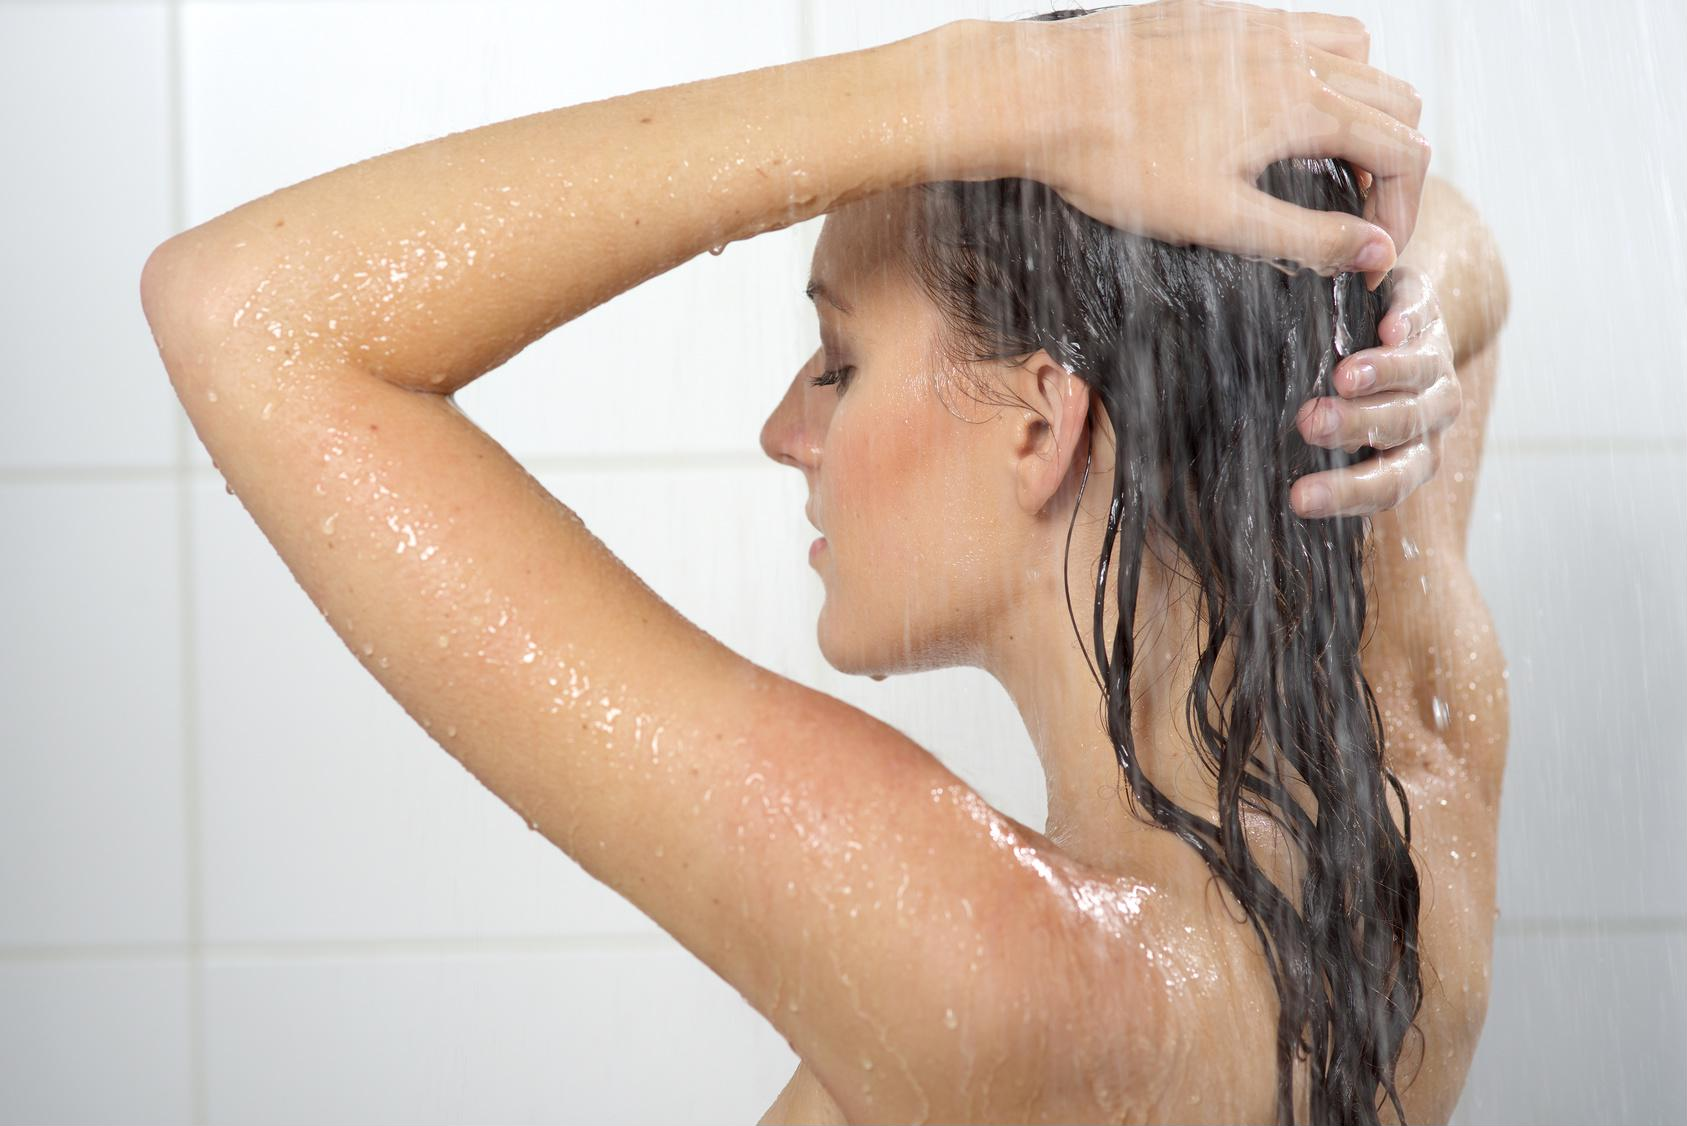 Bí kíp giúp tóc chắc khỏe